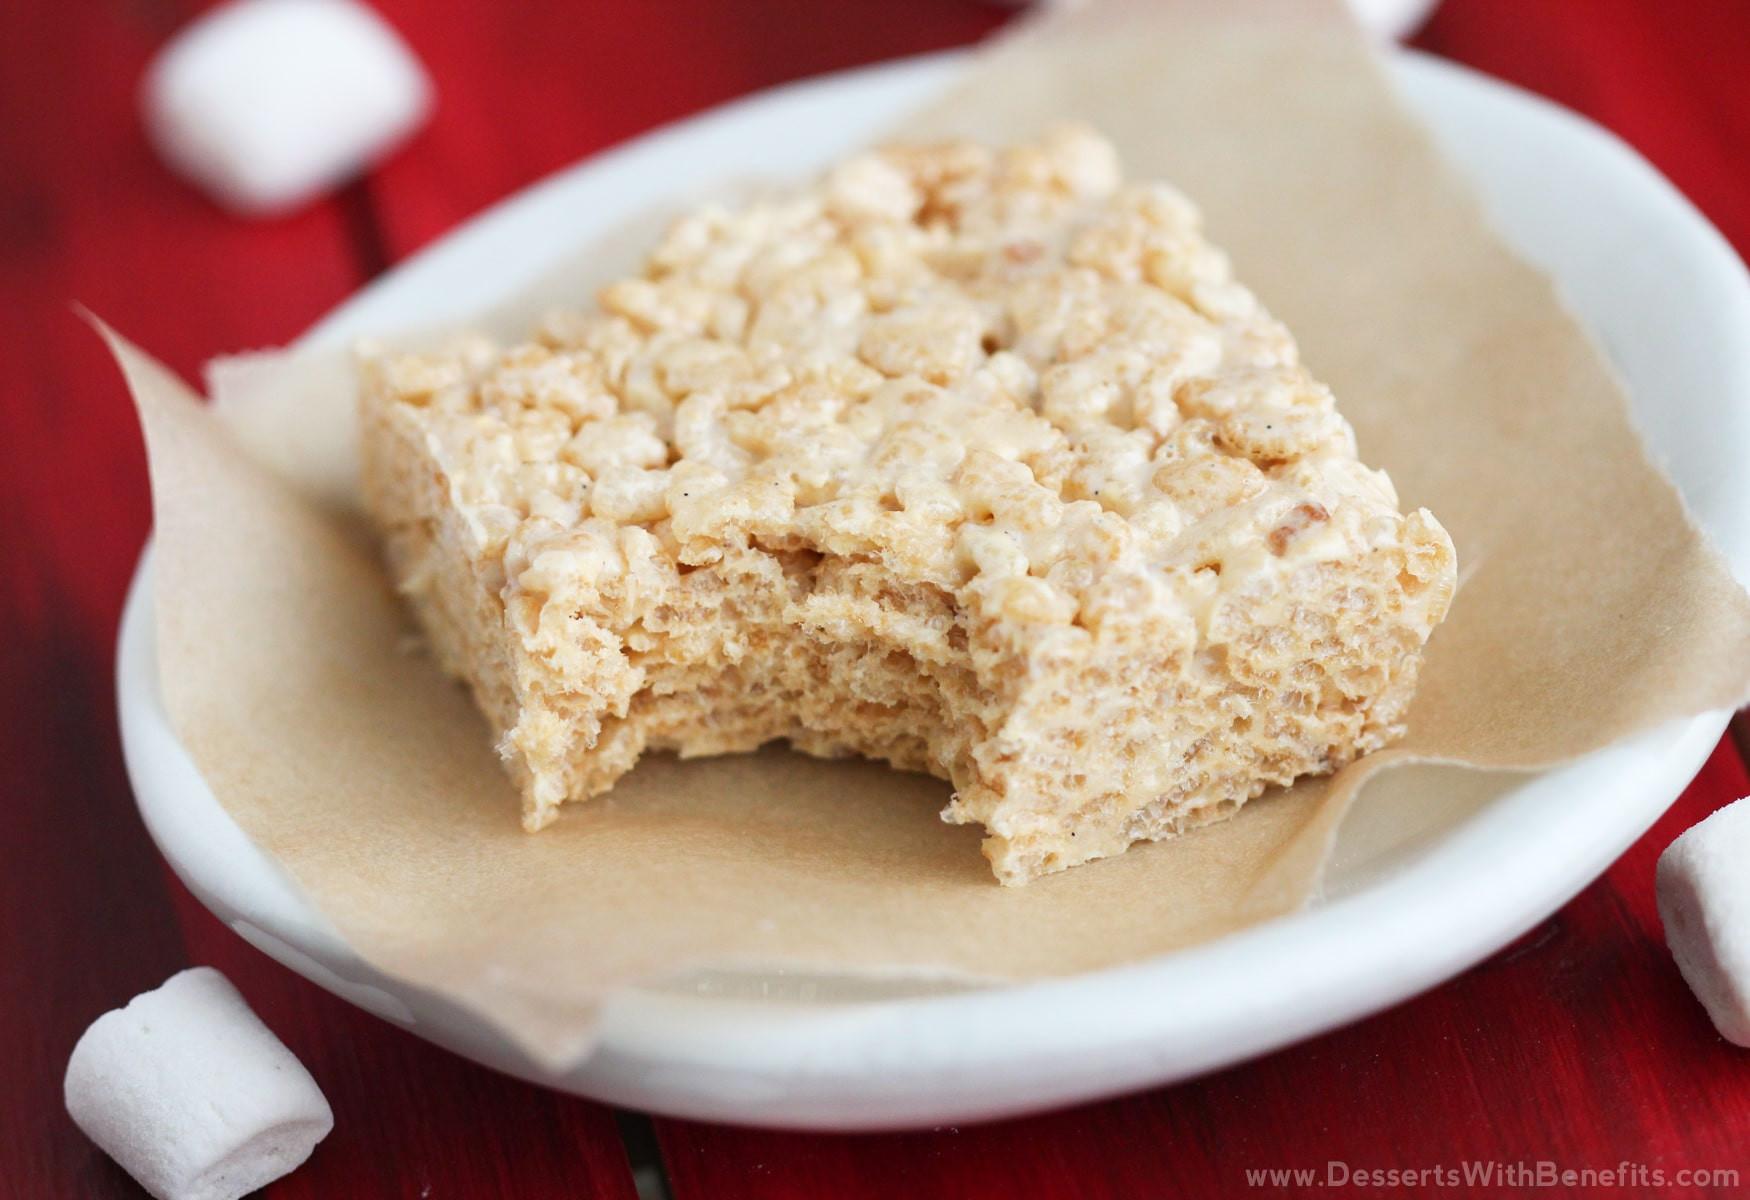 Easy To Make Healthy Desserts  Healthy Gluten Free Protein Krispy Treats Recipe